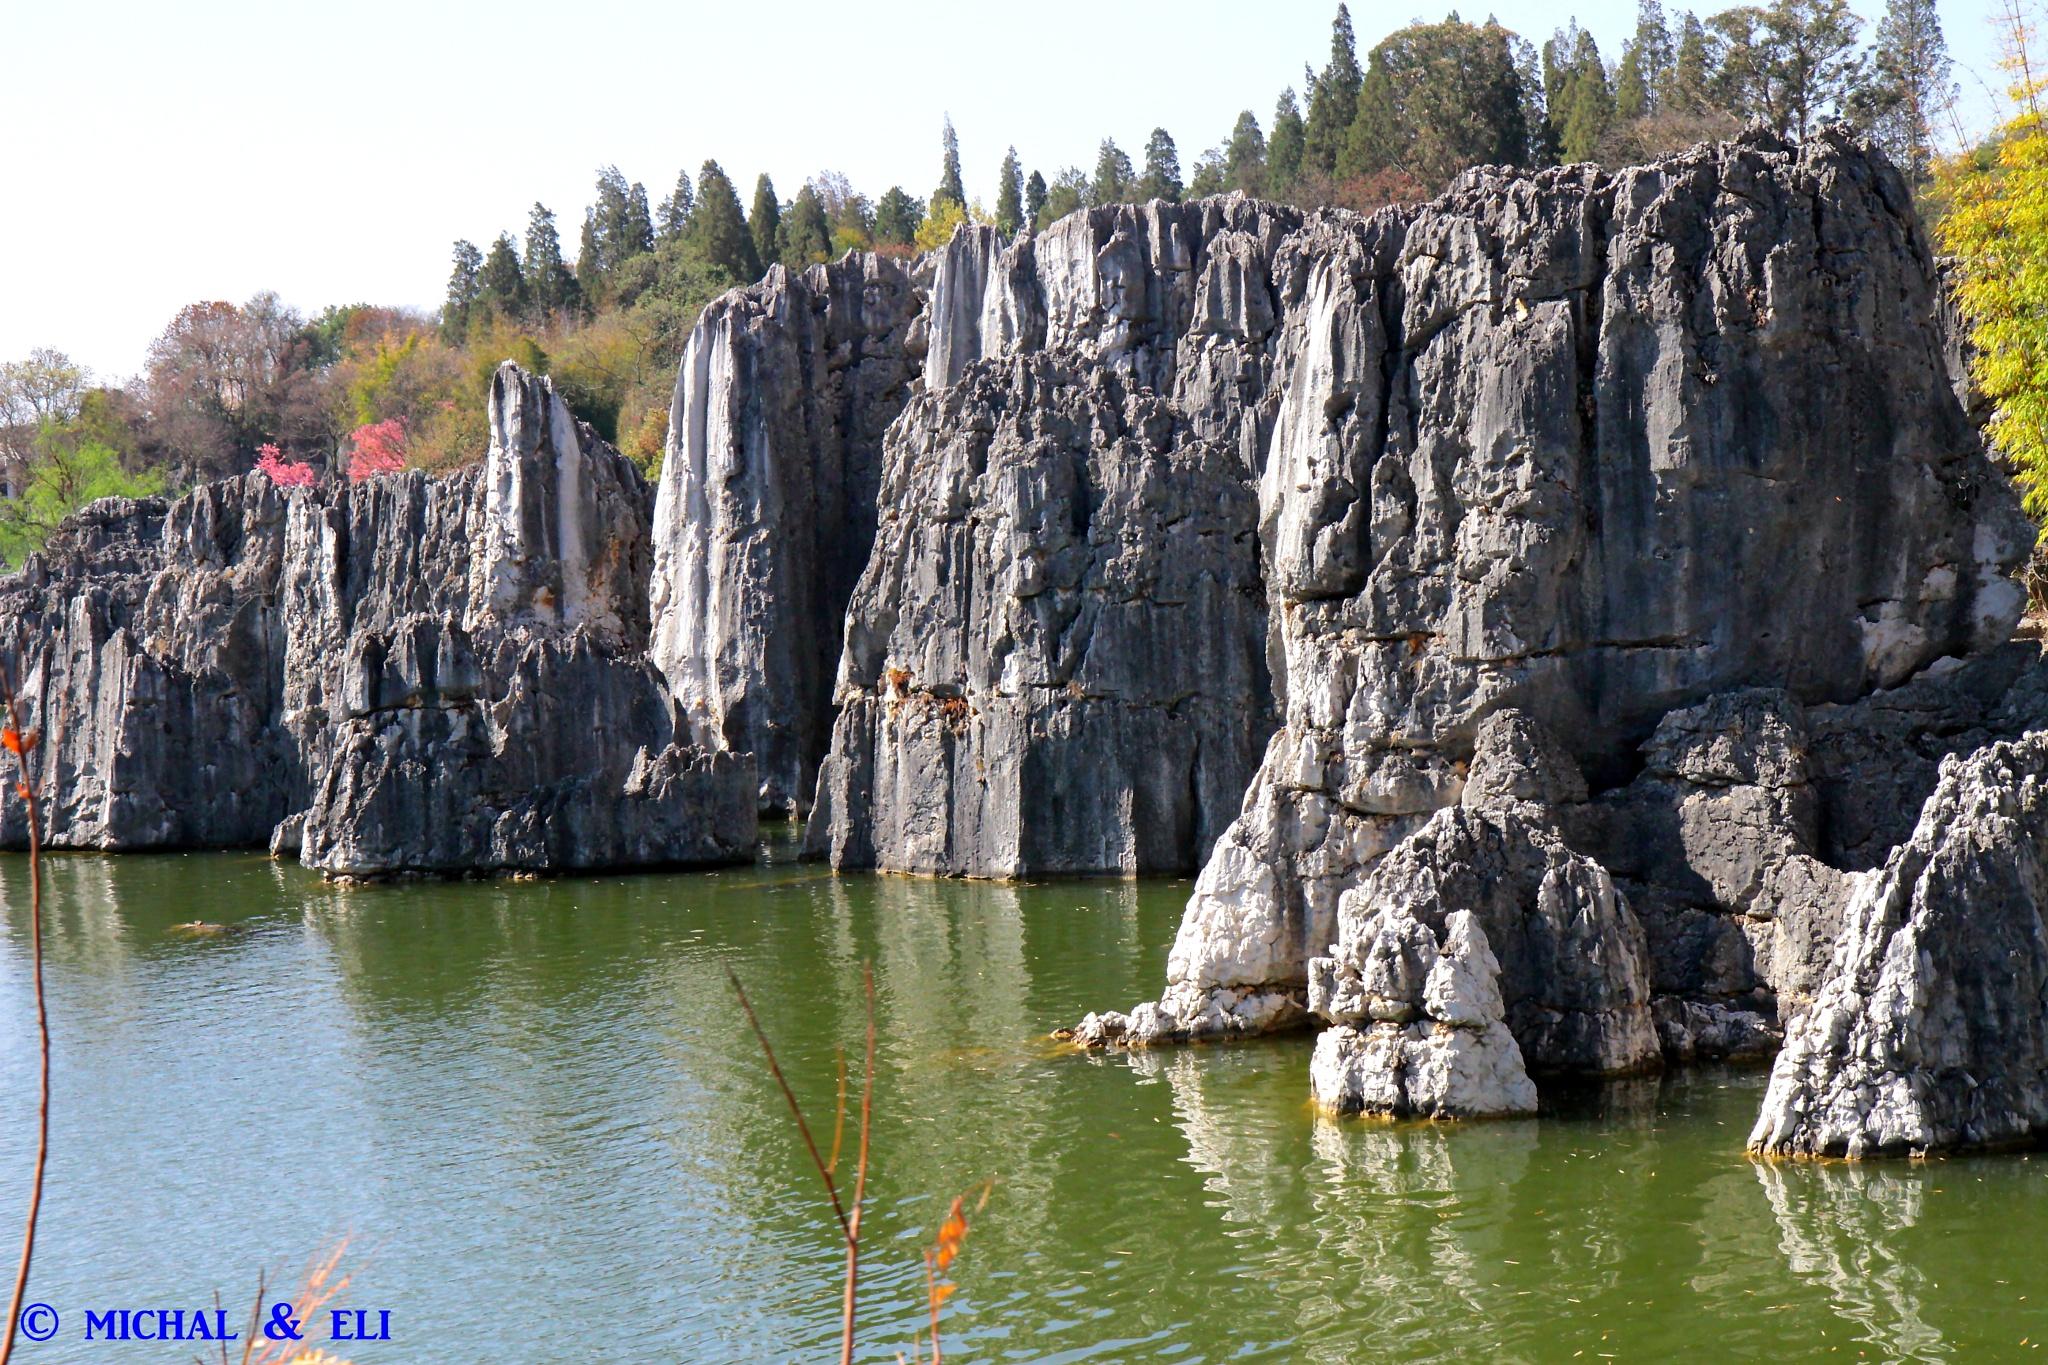 Stone forest ...Shian China  by mieymay